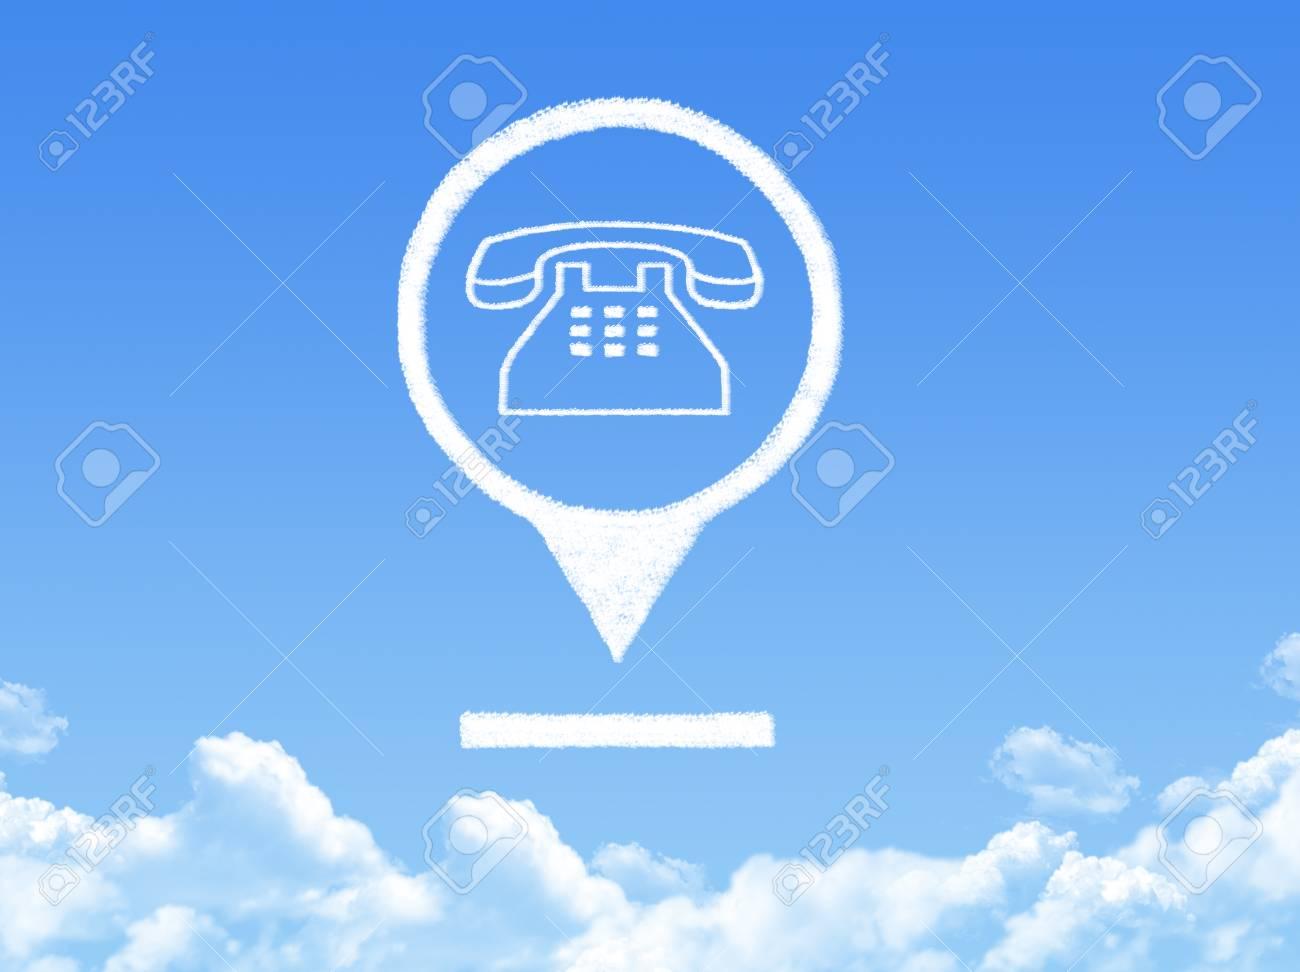 phone location marker cloud shape Stock Photo - 26478843